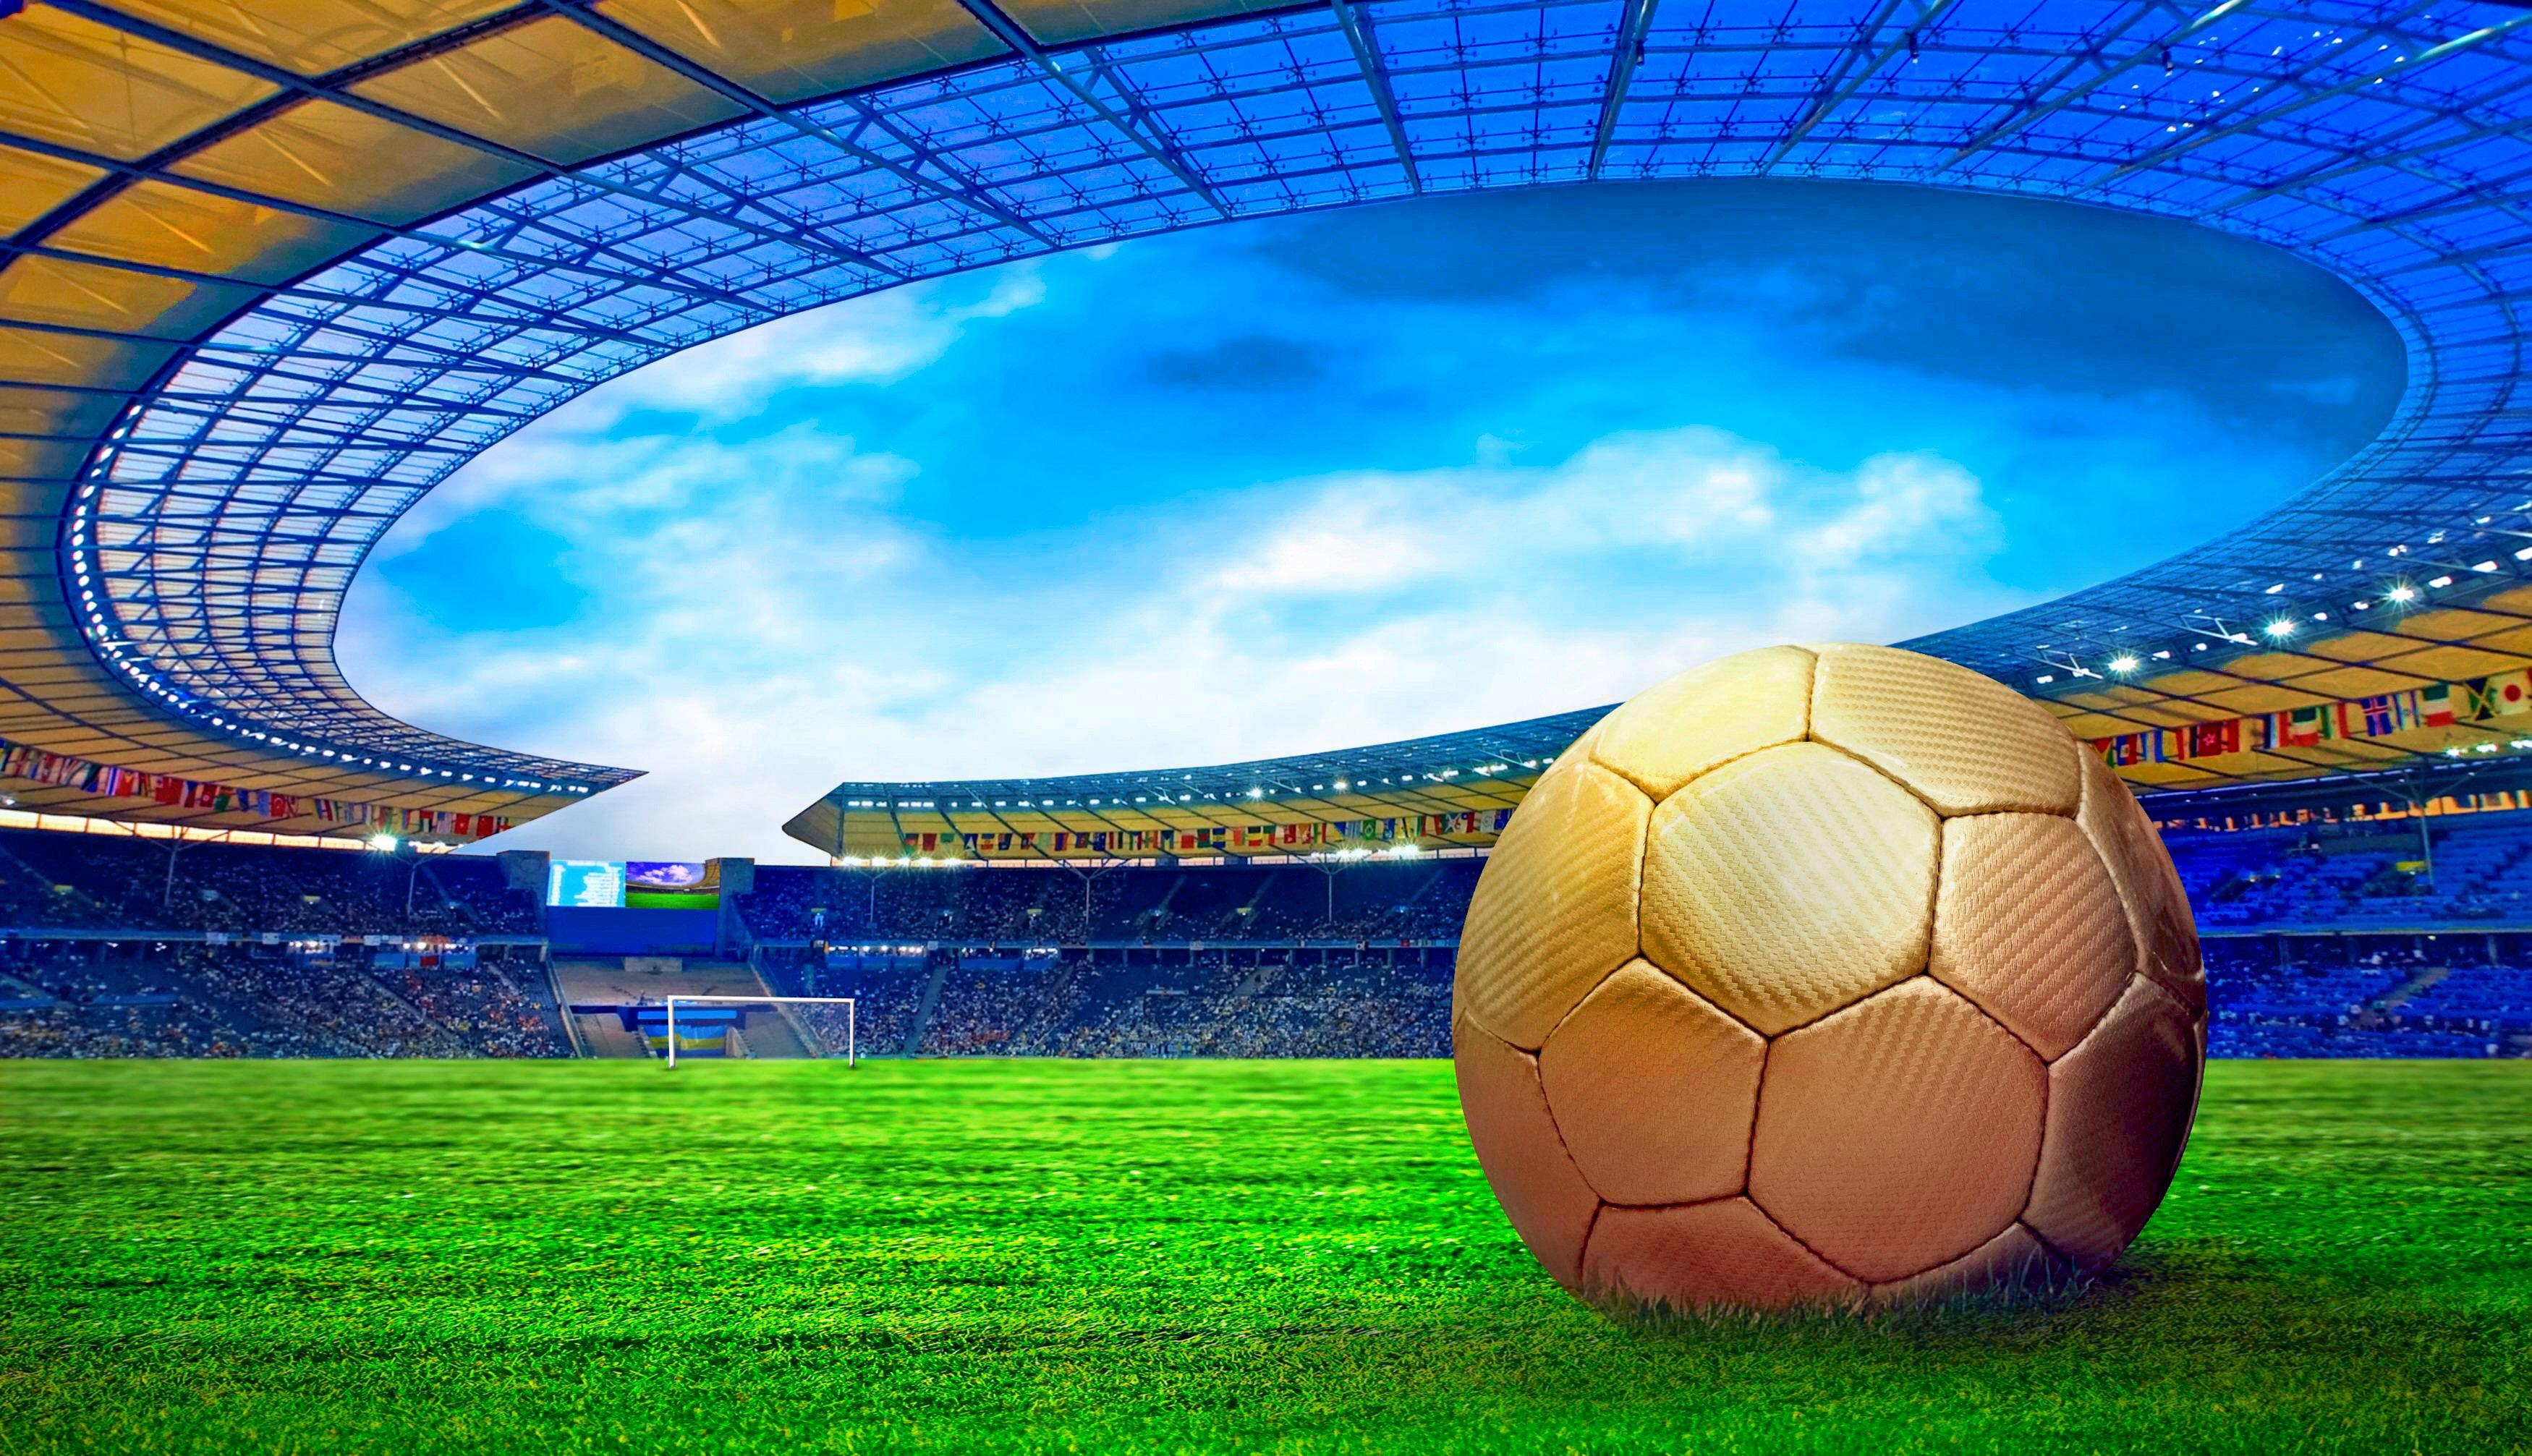 Greenfield 03 nations united on thursday june12th for Fondos de futbol